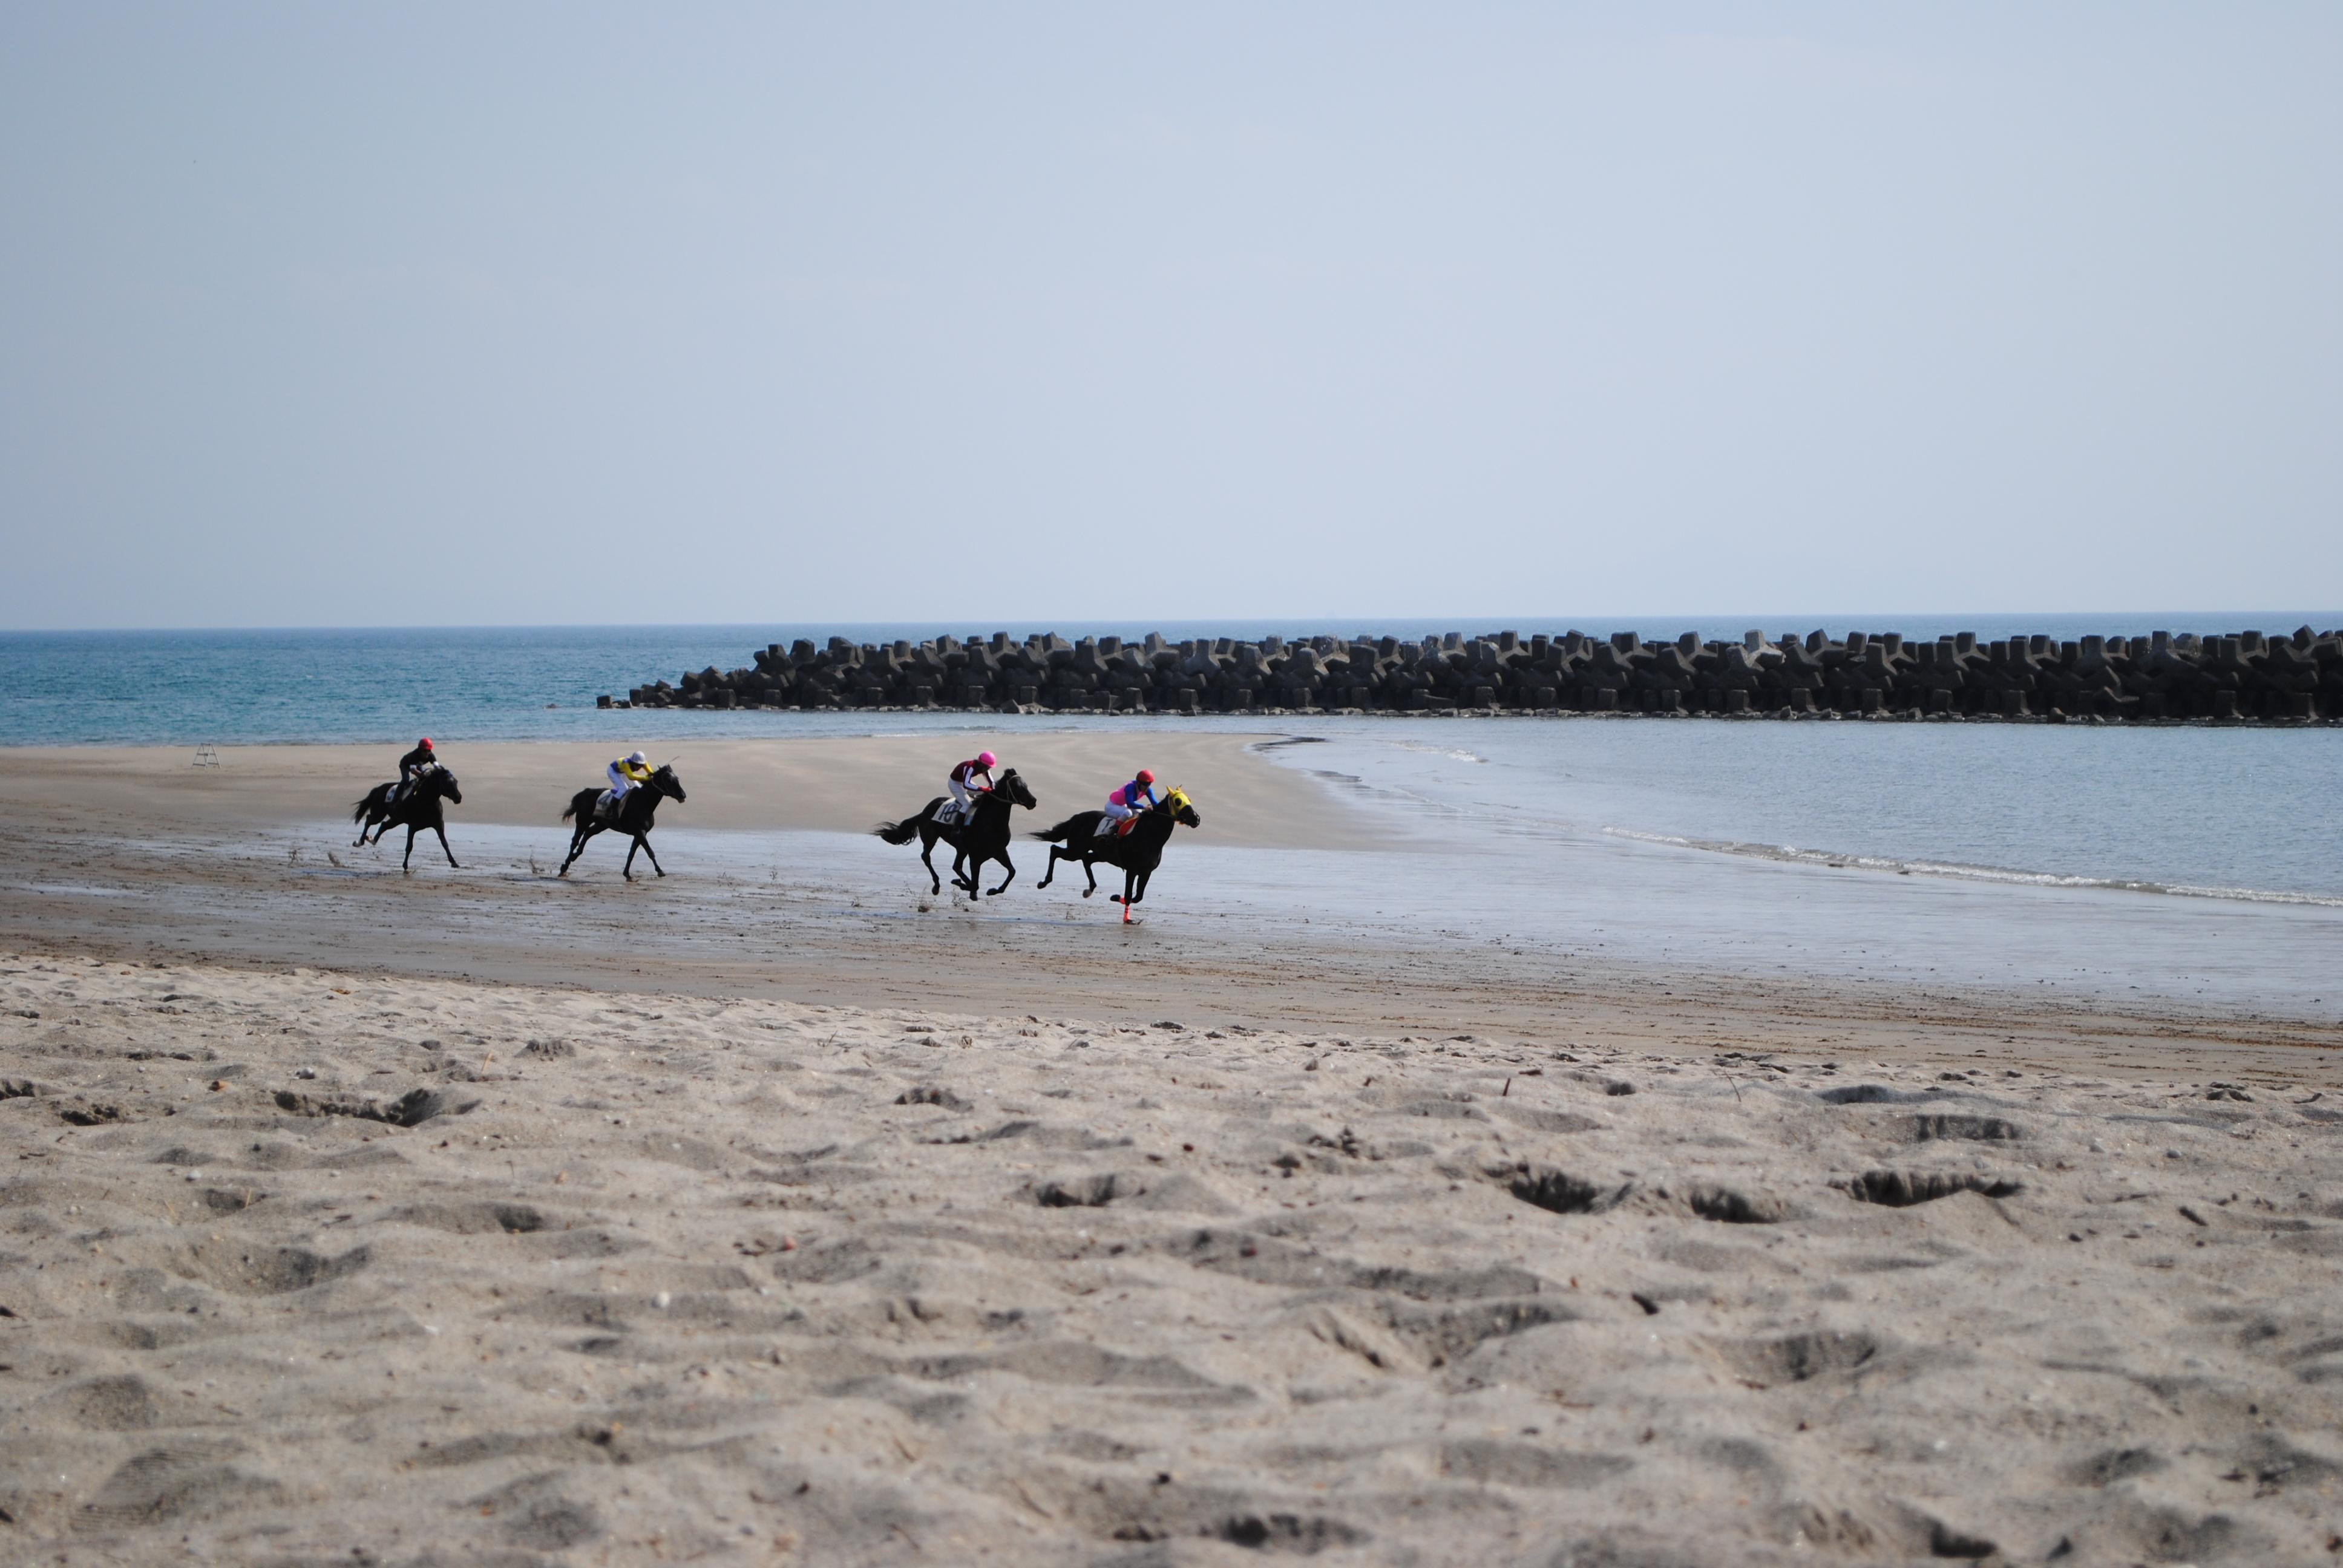 春の風物詩 串木野浜競馬